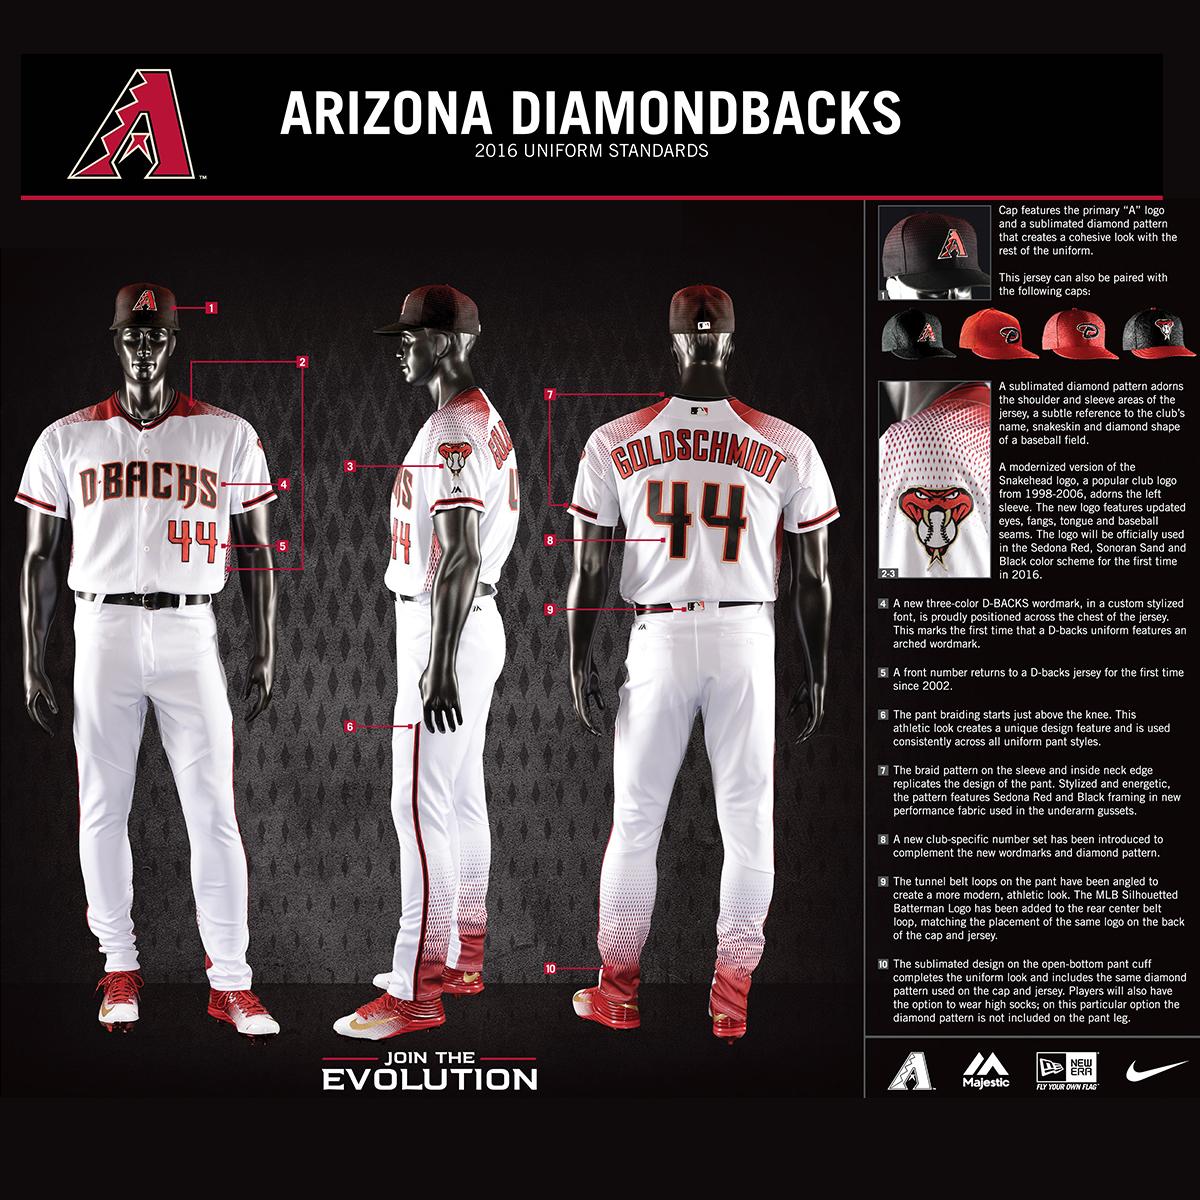 2016 Arizona Diamondbacks New Uniforms on Behance d5f3f4754